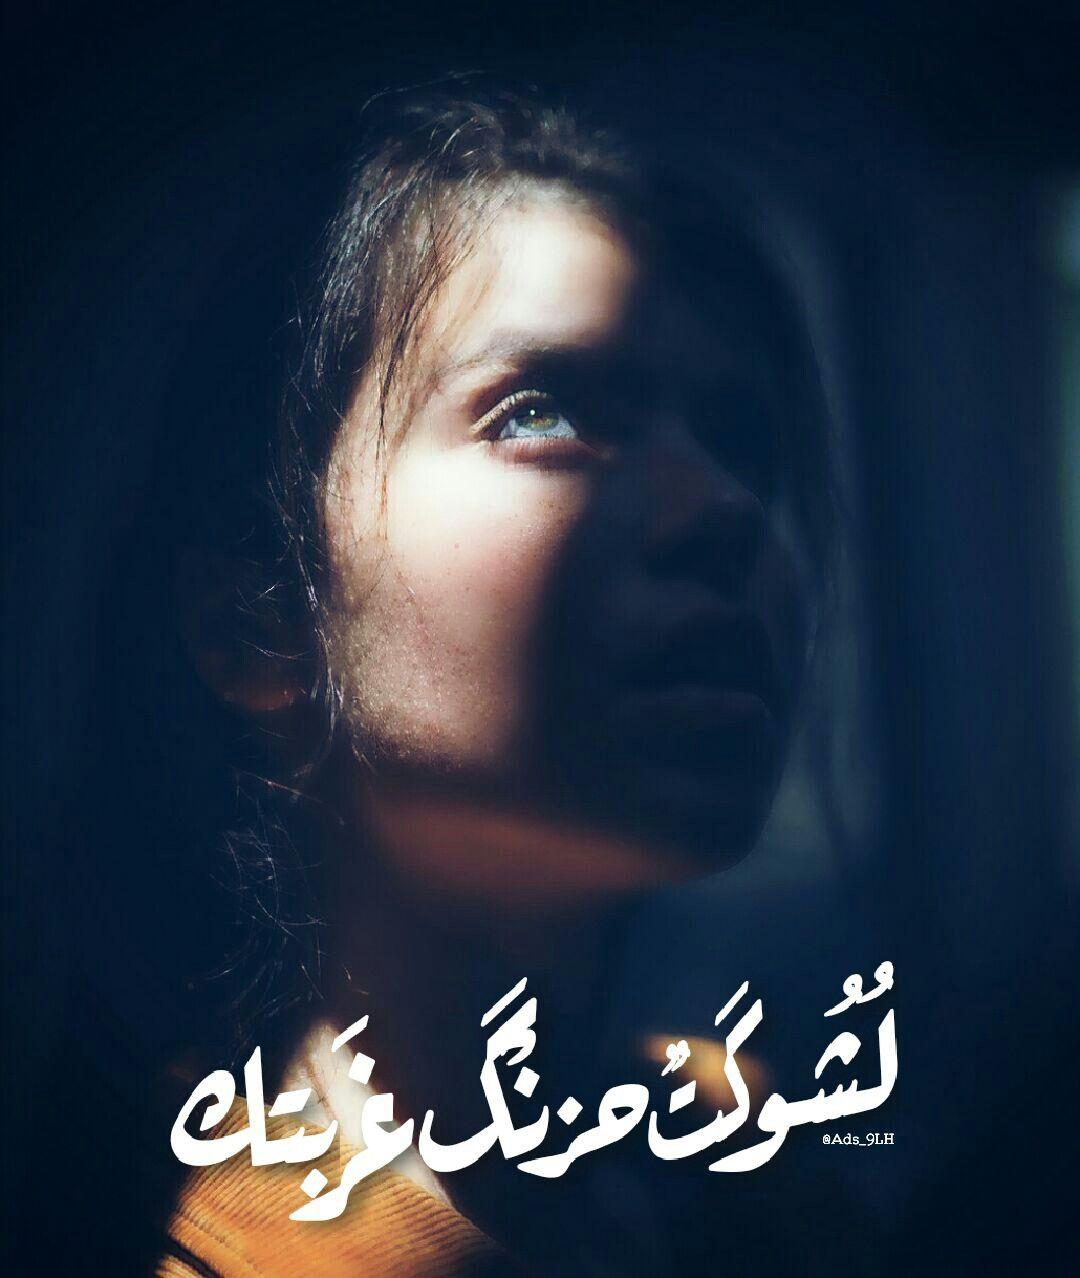 Pin By N I V ɑ ɑ V D On أ ج ـم ل أ ل ک ل أ م أ ش ـع أ ر Movie Posters Poster Art